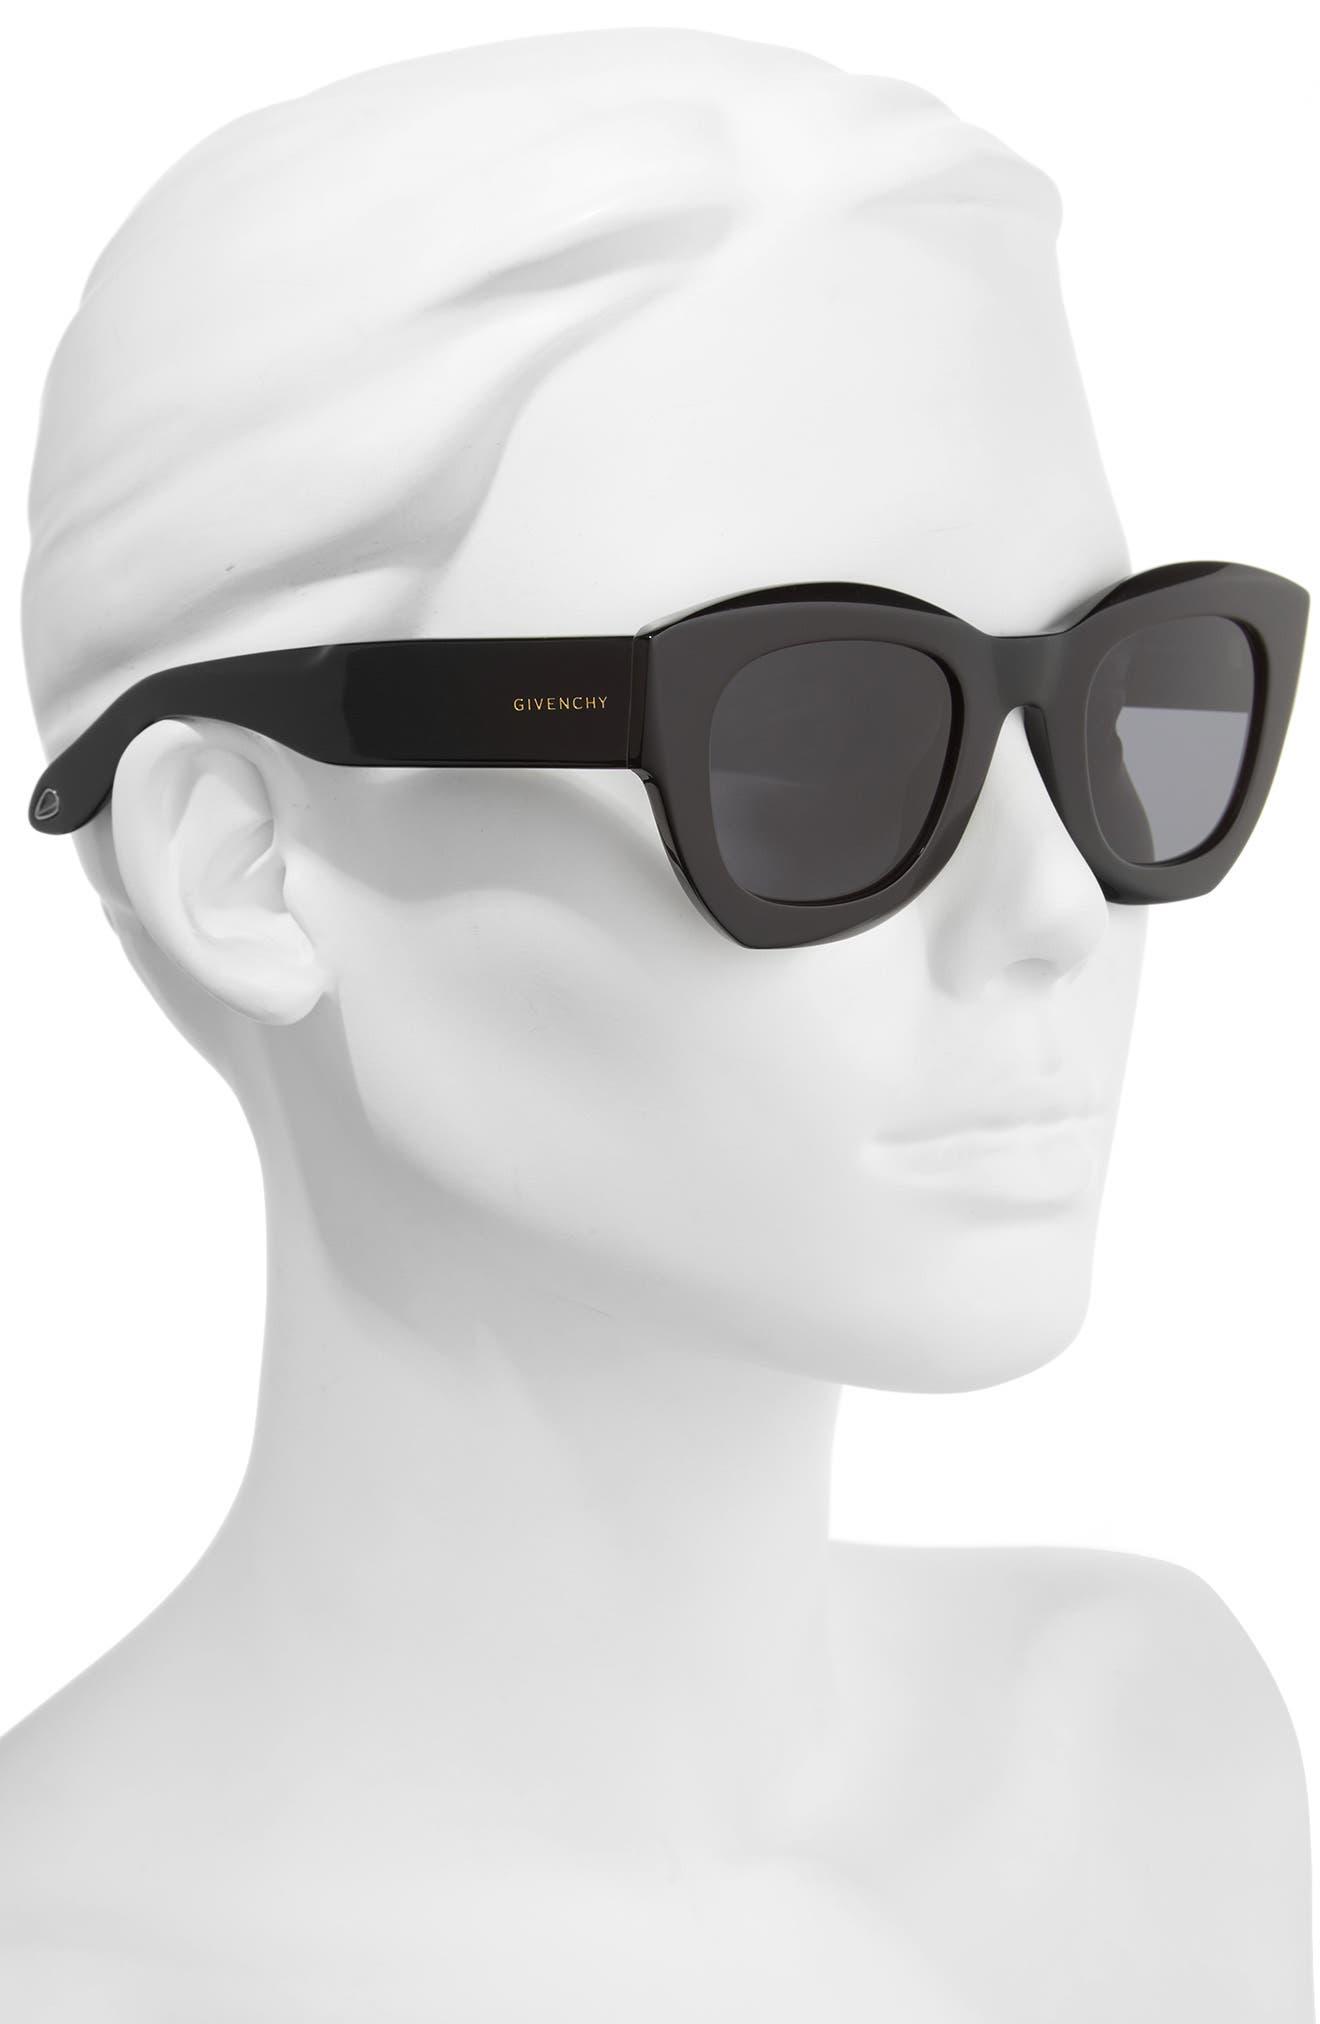 48mm Cat Eye Sunglasses,                             Alternate thumbnail 2, color,                             001